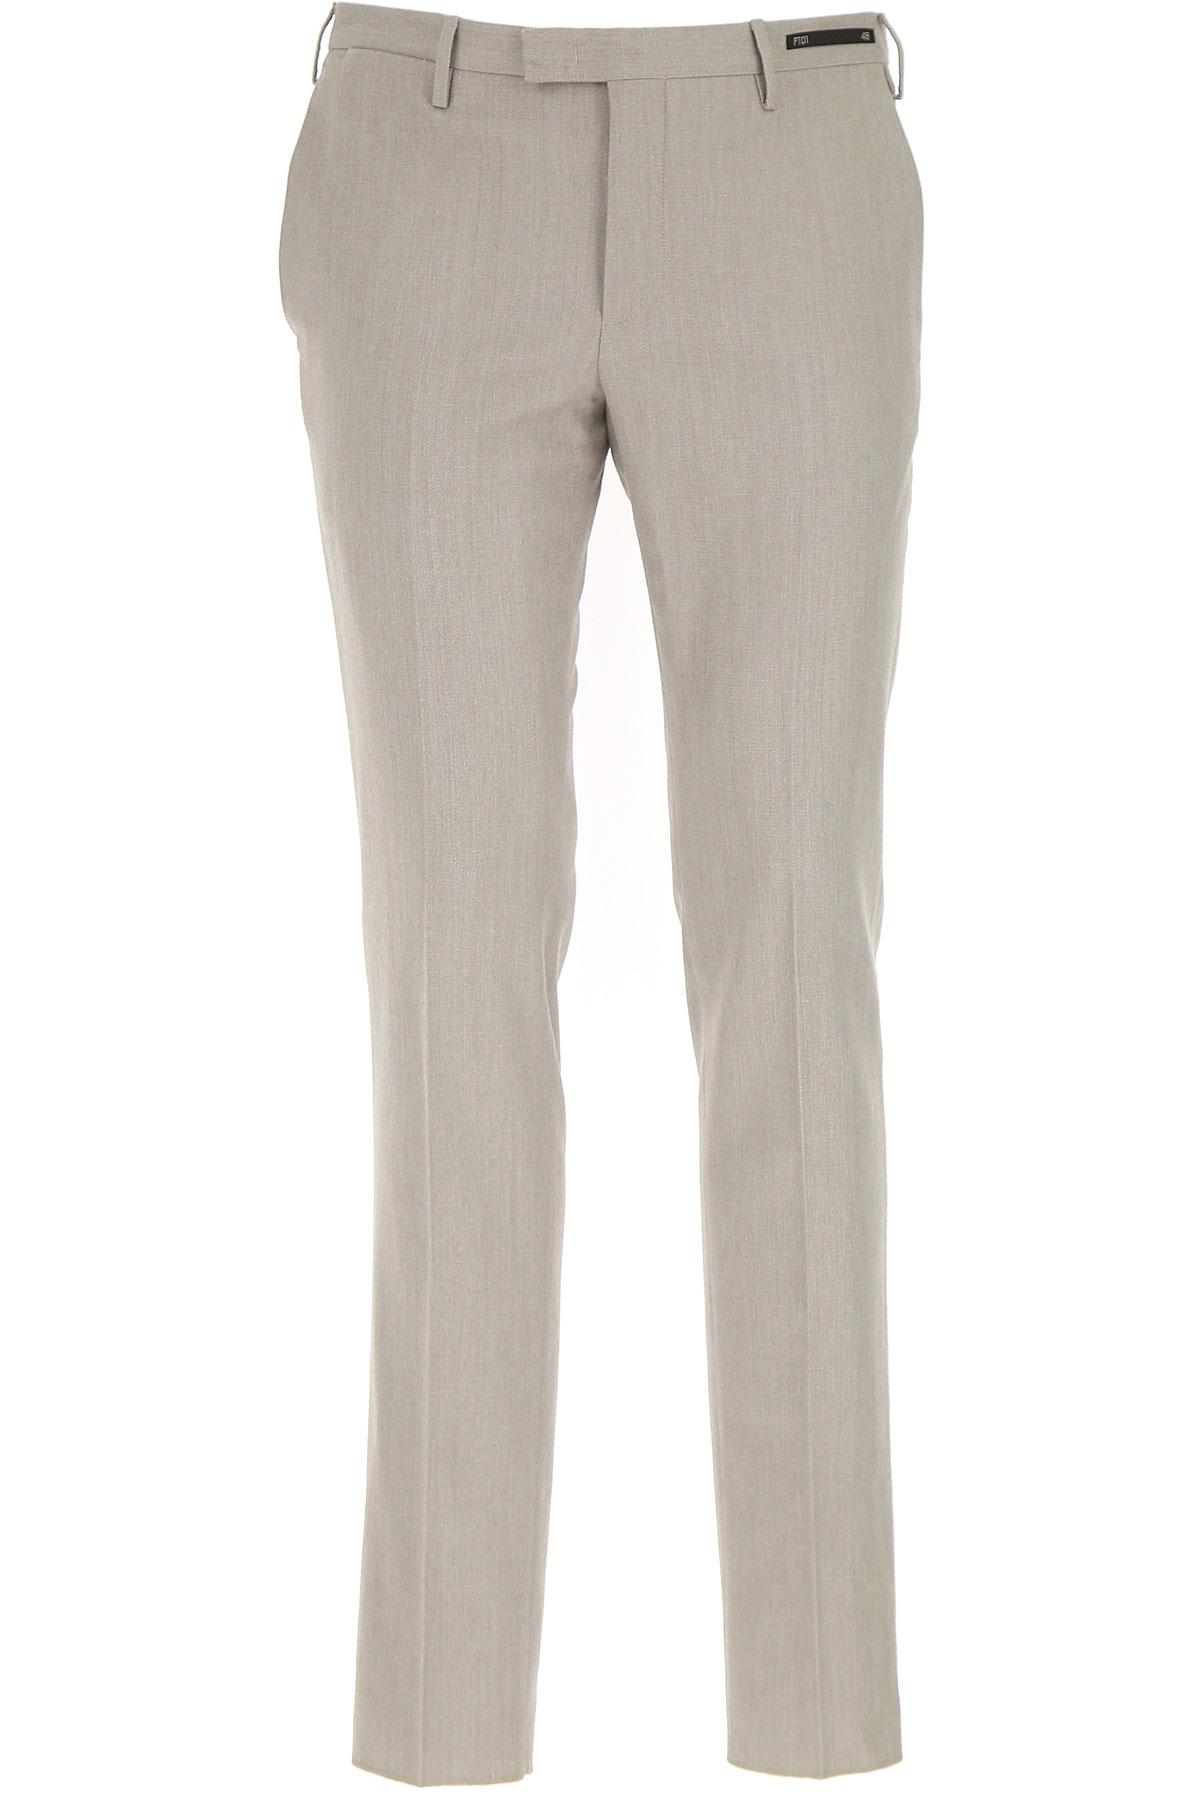 Image of PT01 Pants for Men, Beige, Virgin wool, 2017, 30 31 32 33 34